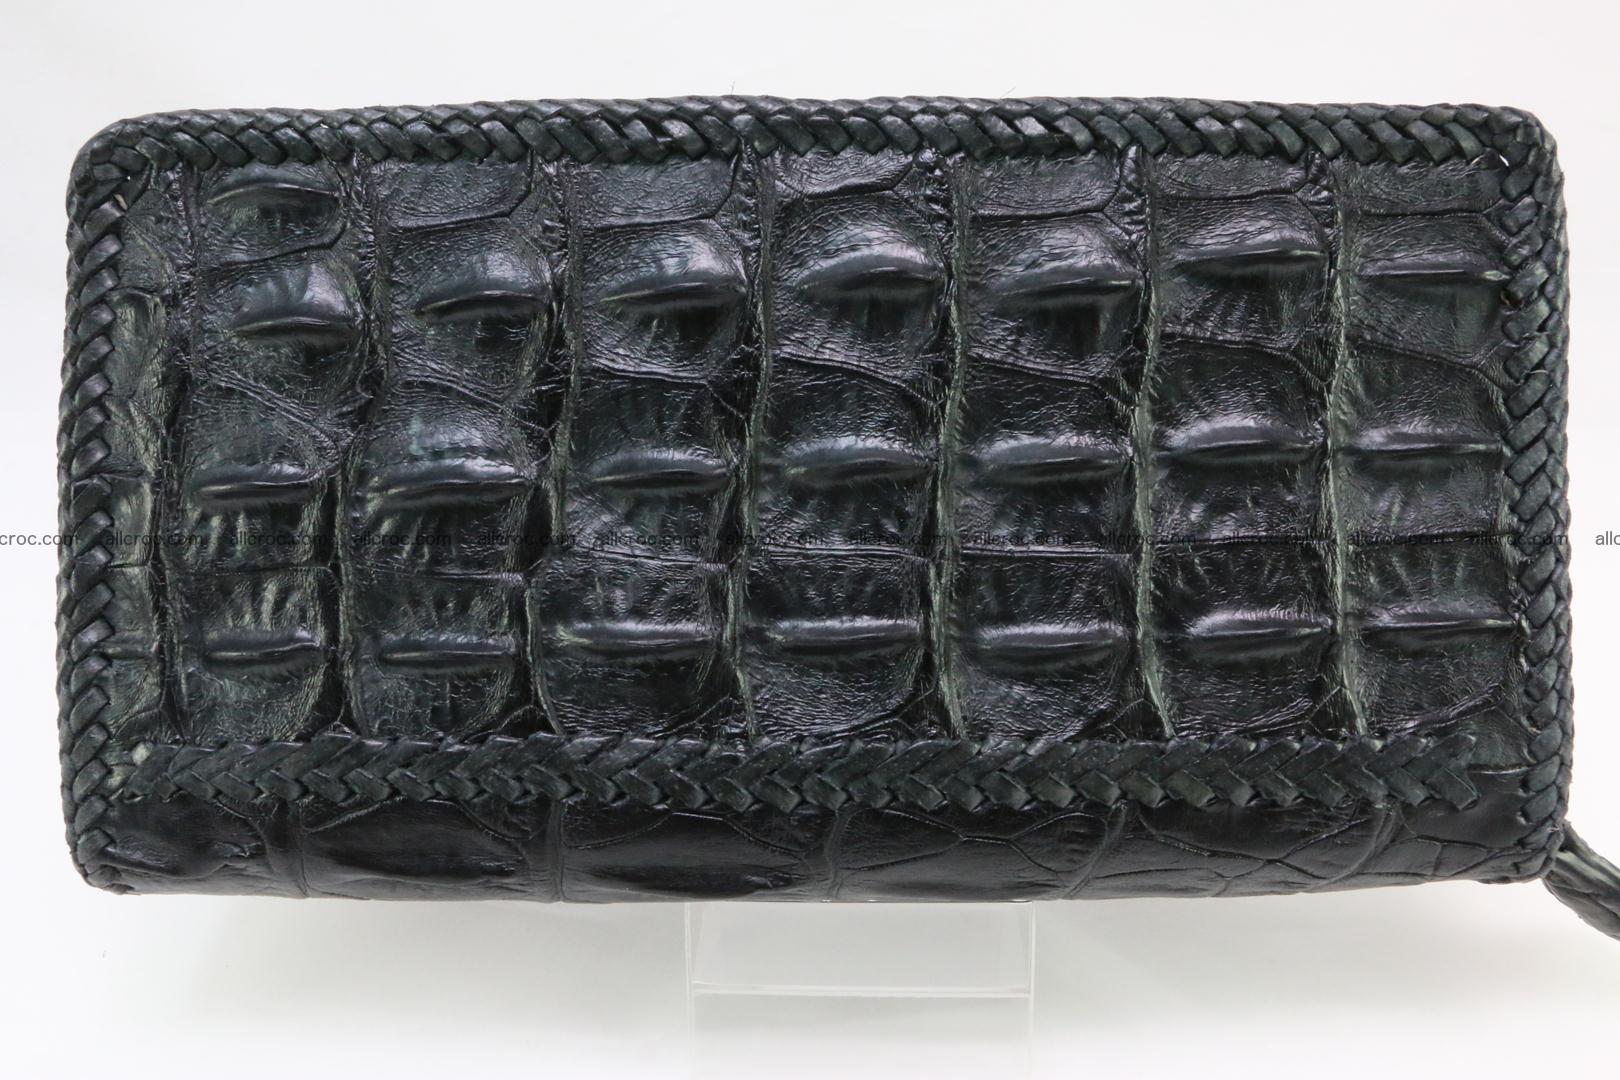 Genuine crocodile hornback wallet with zip 109 Foto 2